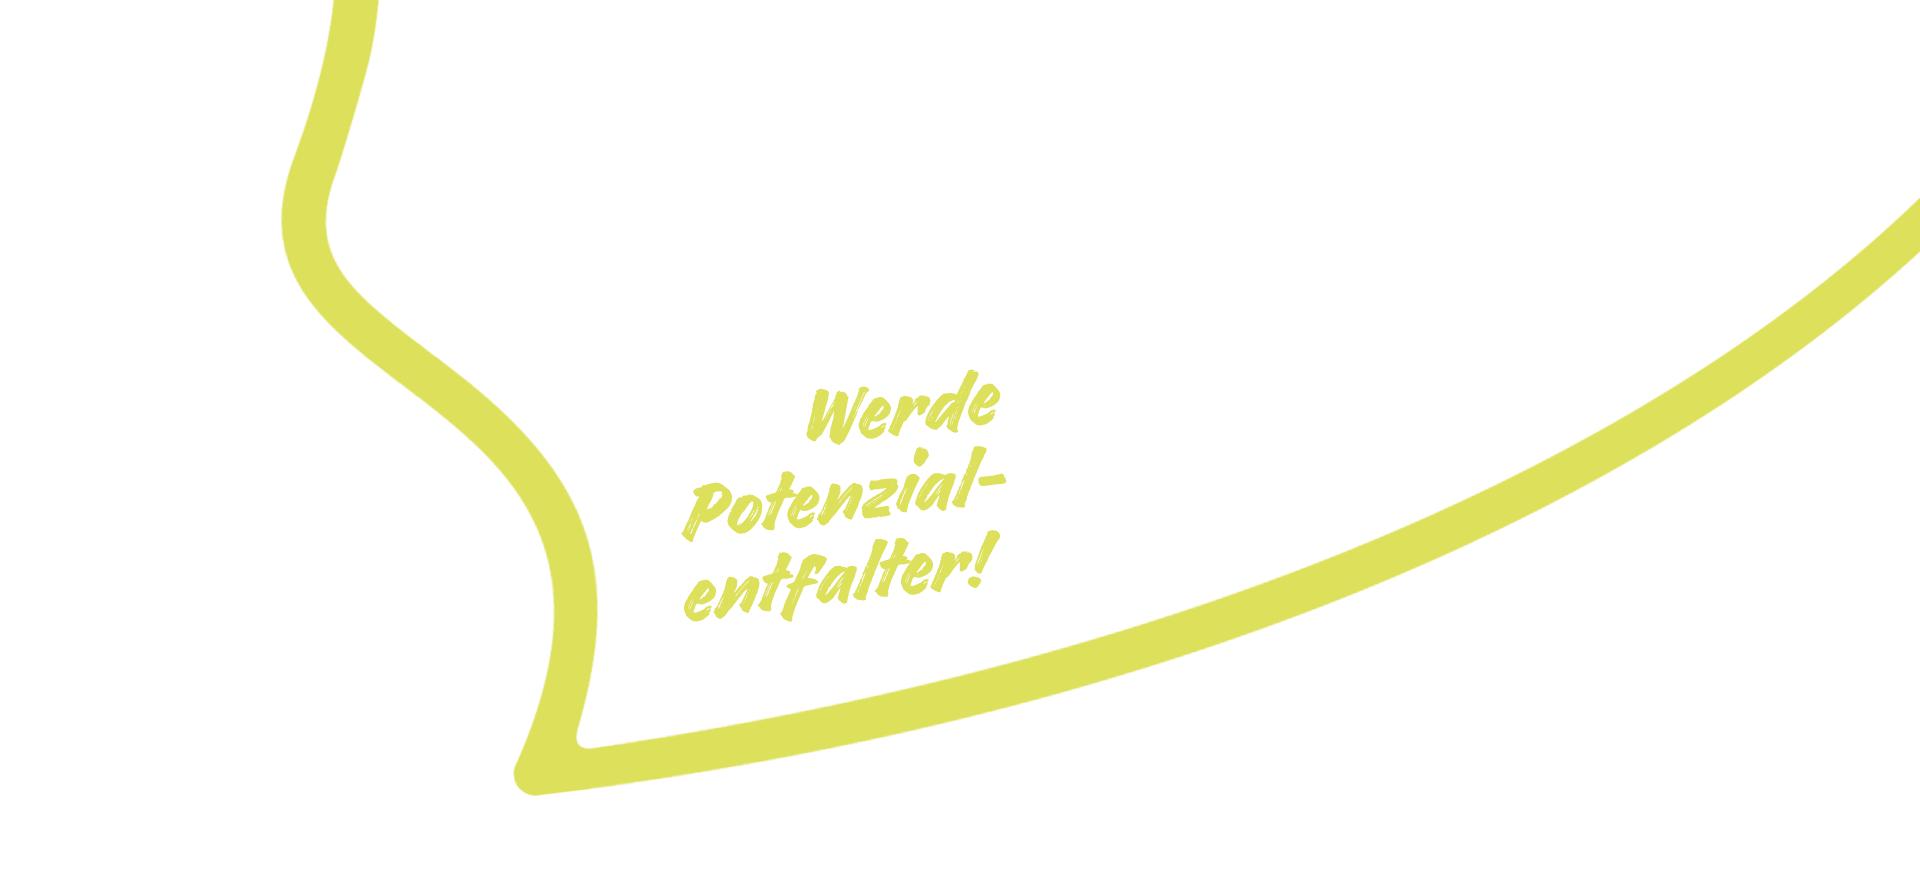 HERO_SOCIETY-Werde_Potenzialentfalter